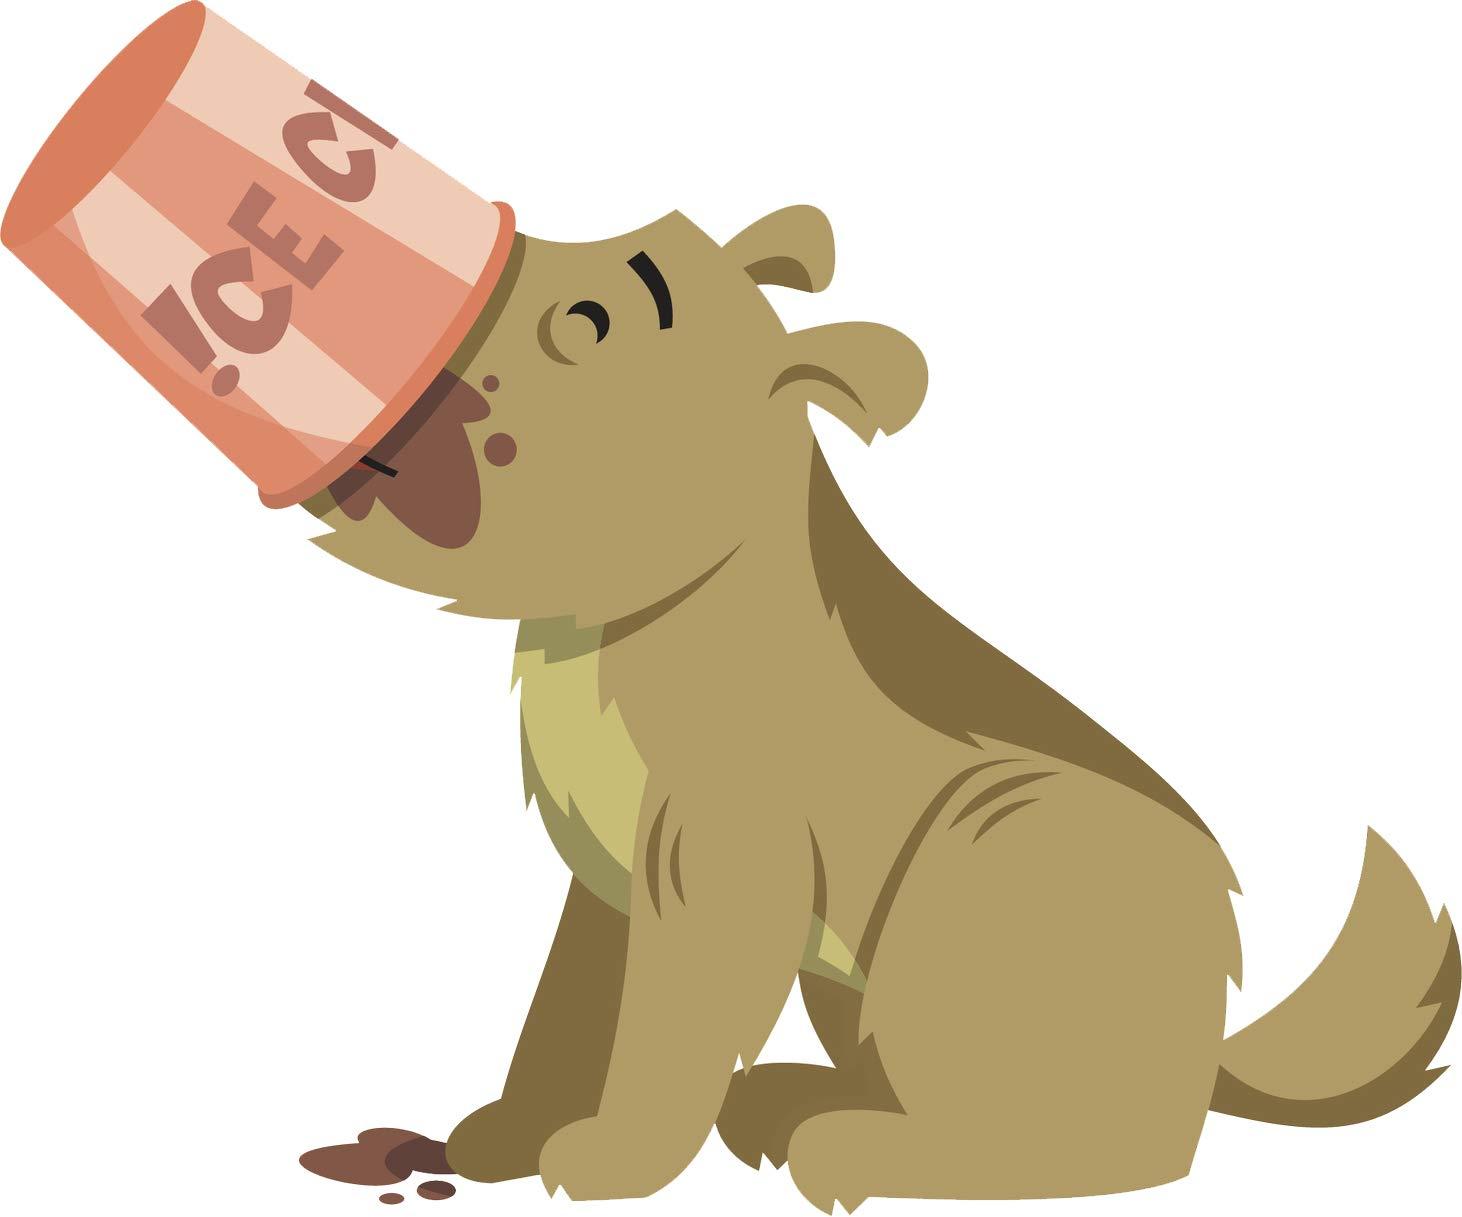 Amazoncom Adorable Silly Naughty Eating Scruffy Puppy Dog Cartoon